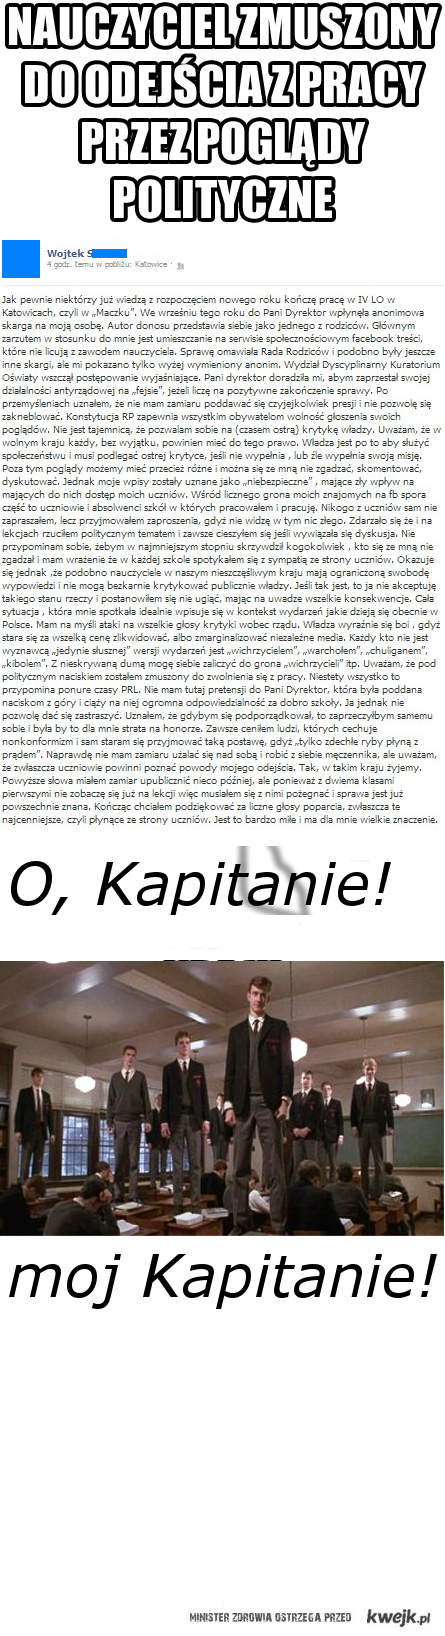 O, Kapitanie, moj Kapitanie!